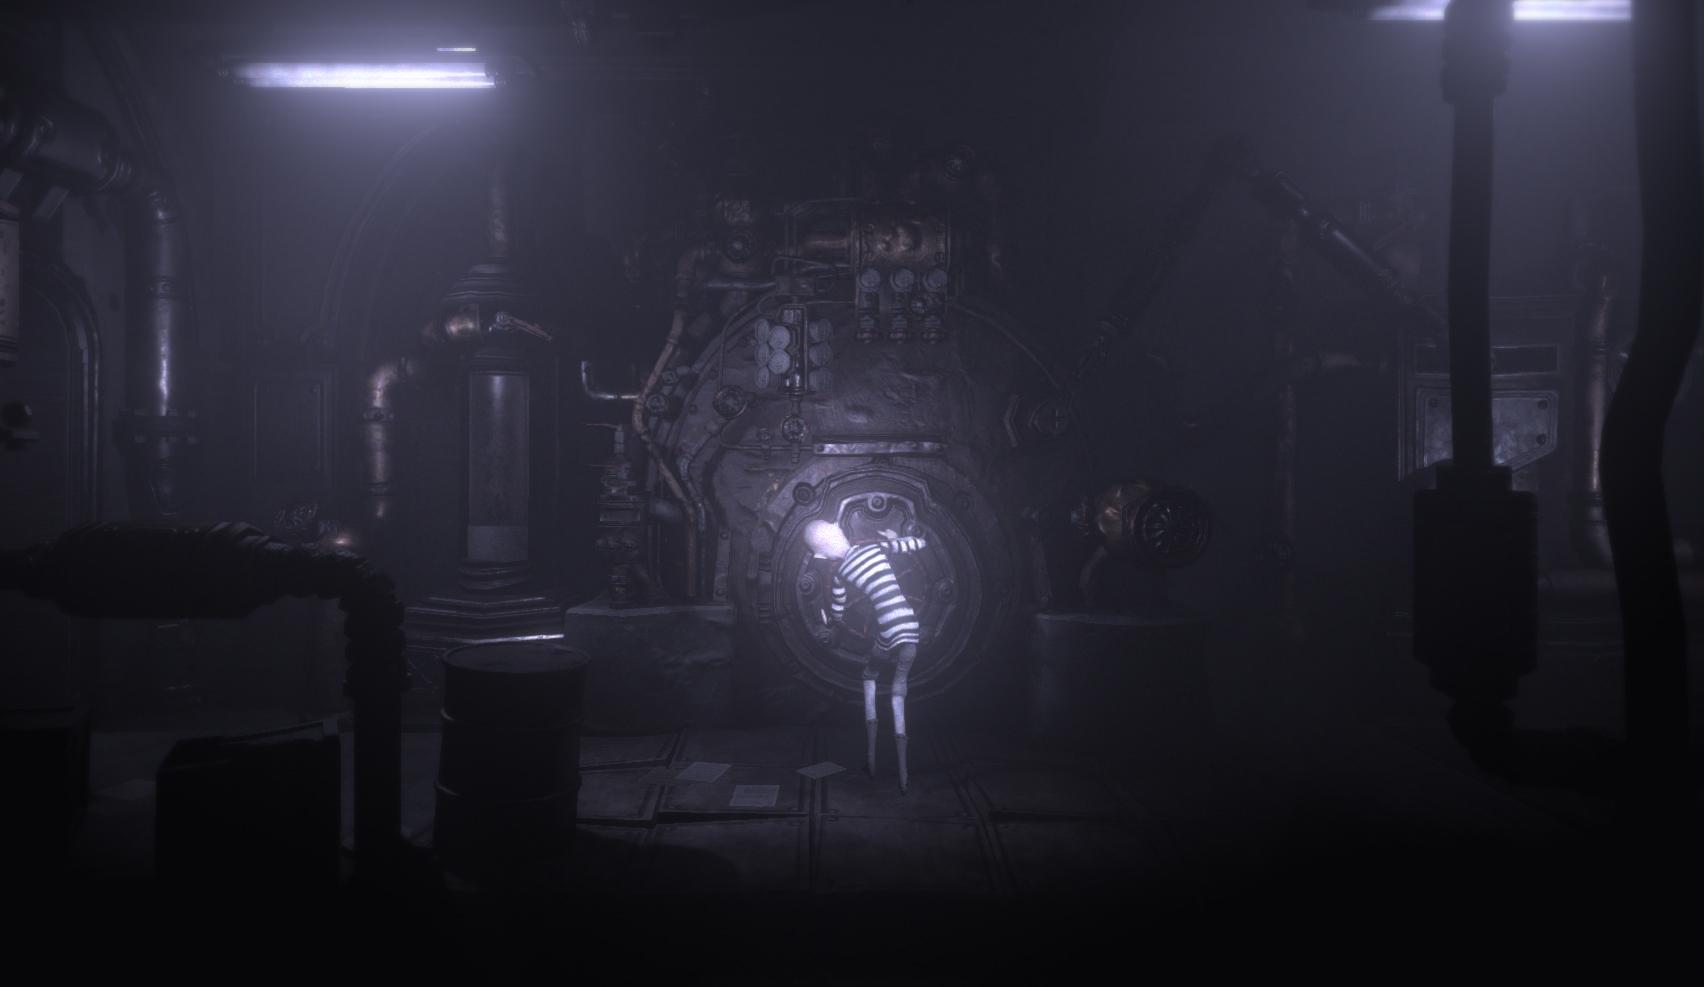 darq-complete-edition-pc-screenshot-03